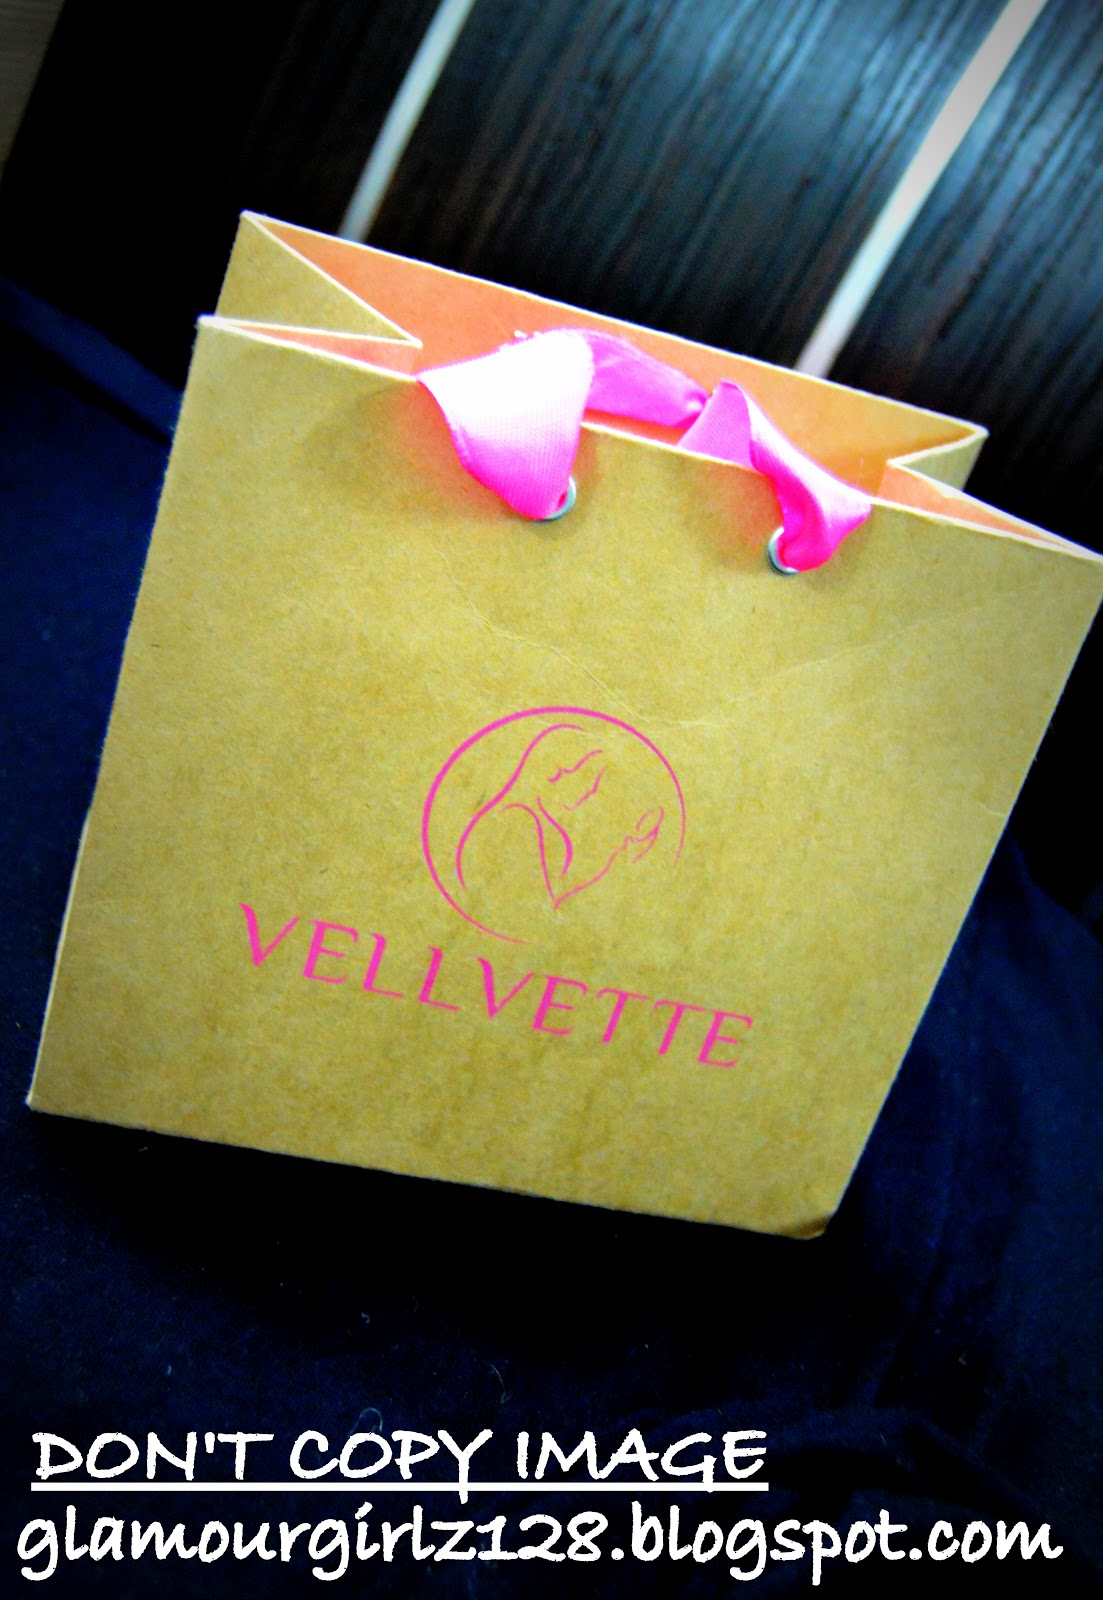 vellvette goodie bag